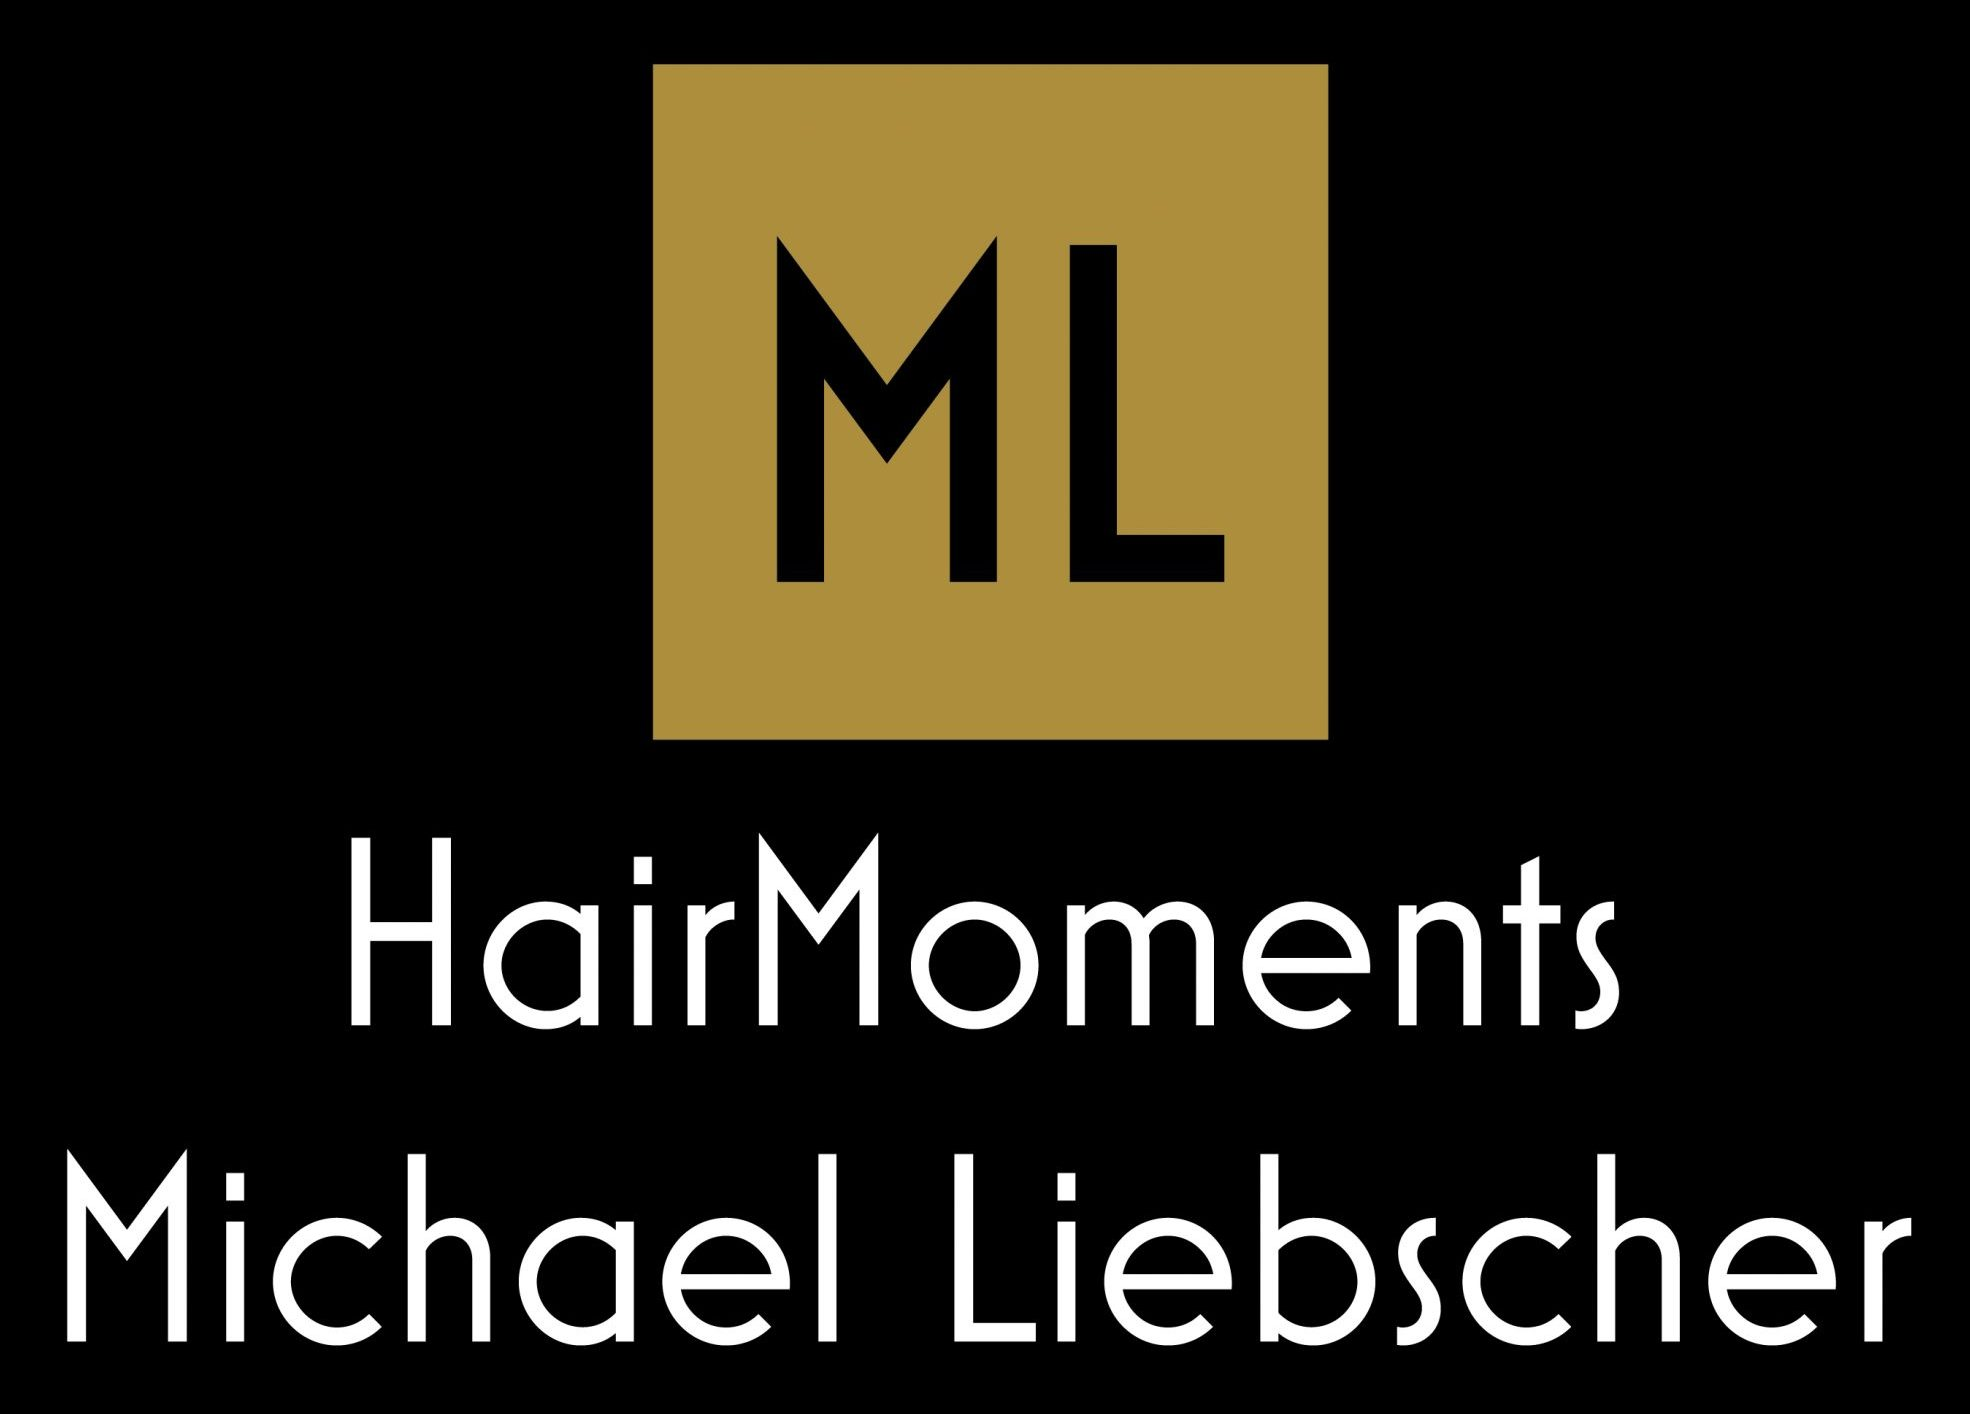 HairMoments Michael Liebscher